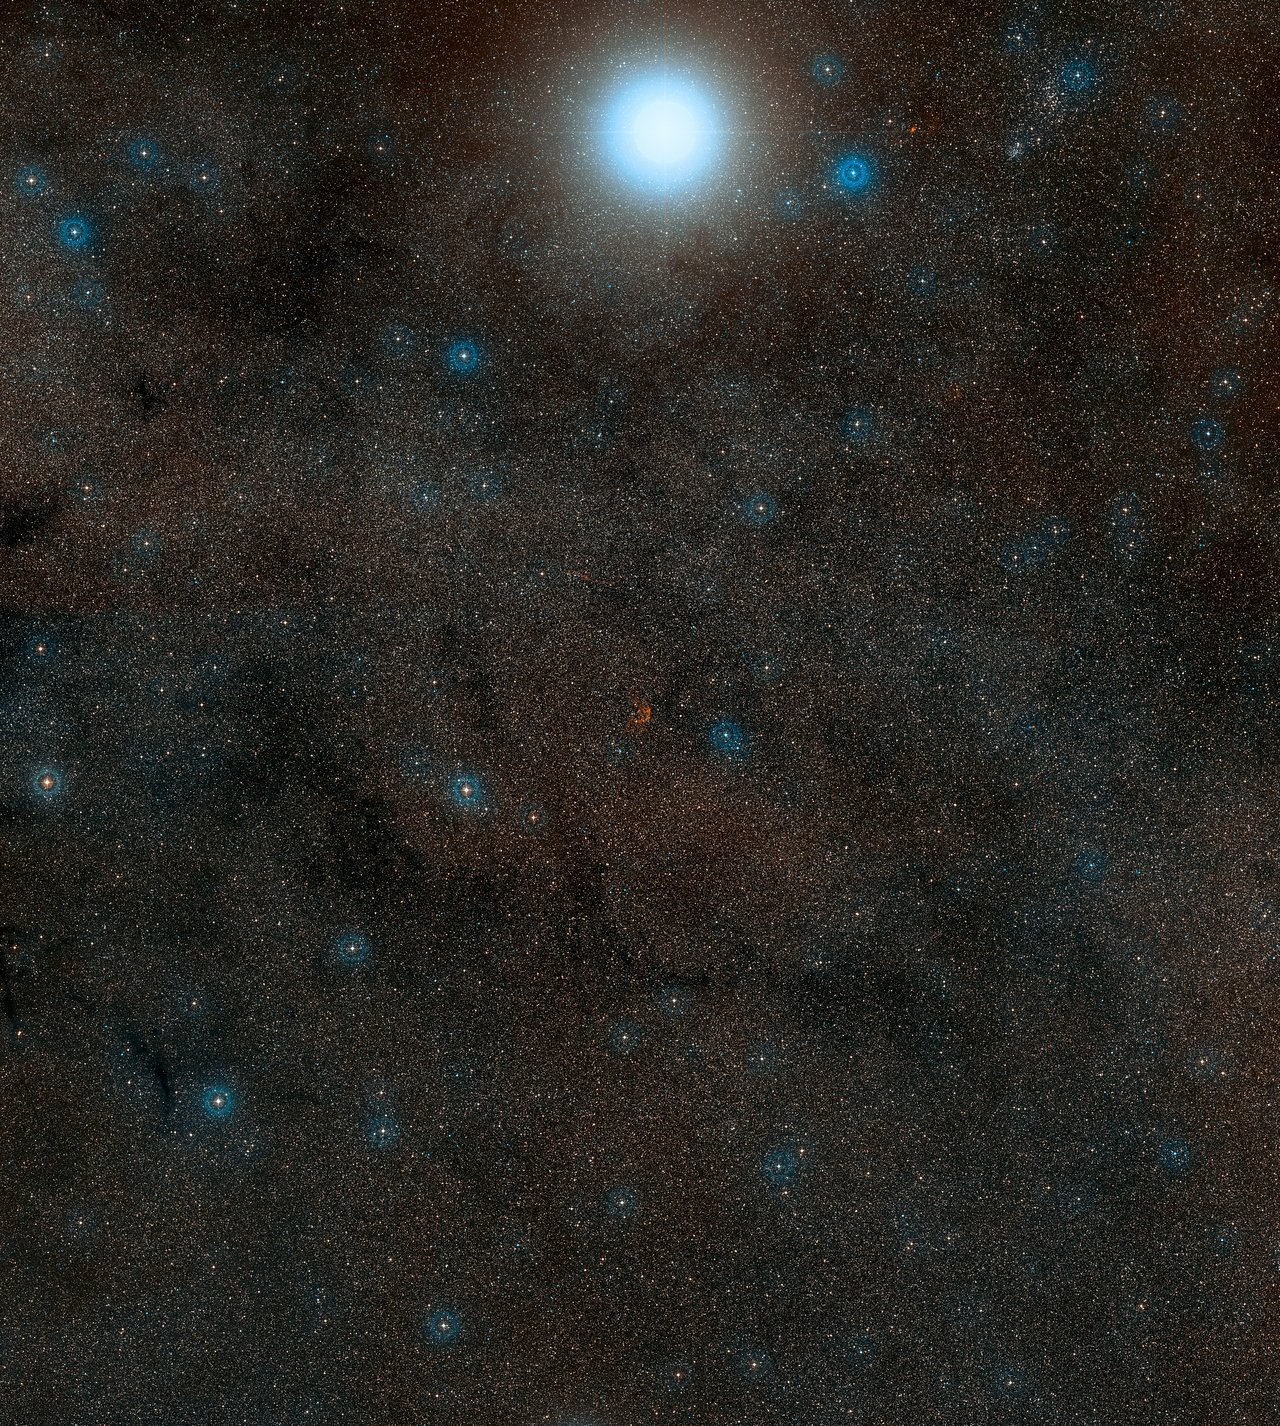 DSS image